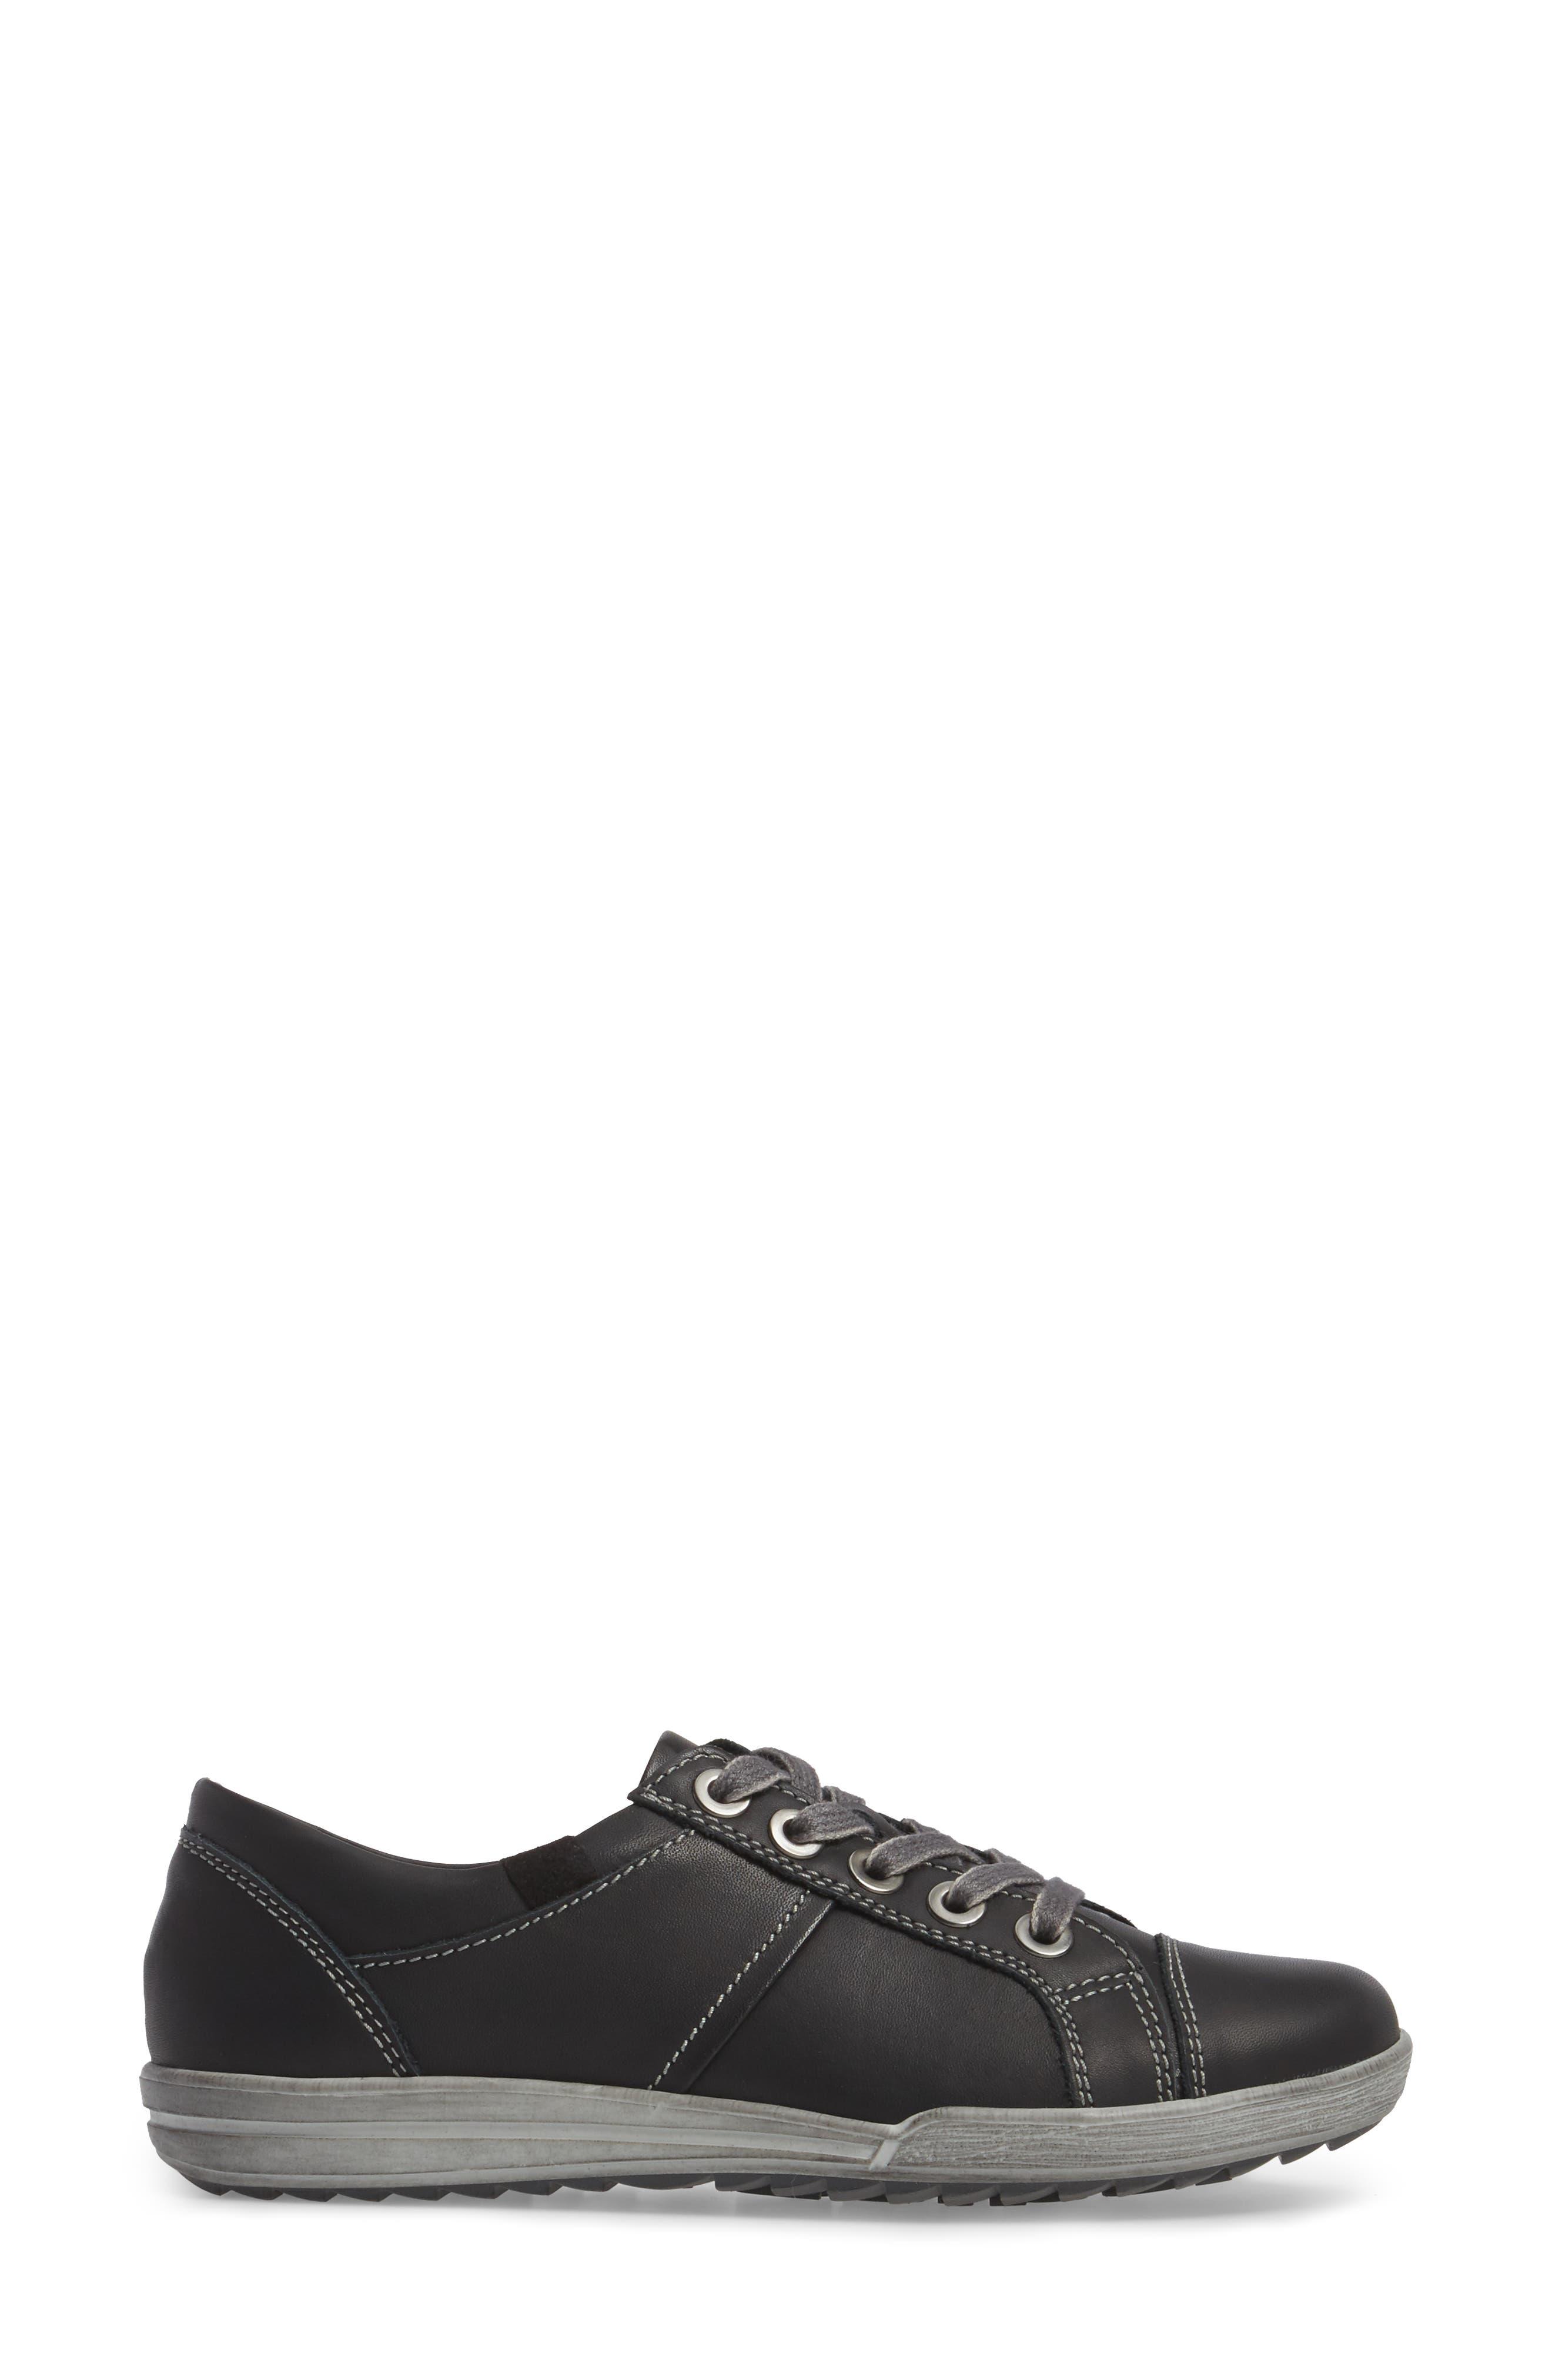 Dany 59 Sneaker,                             Alternate thumbnail 3, color,                             002